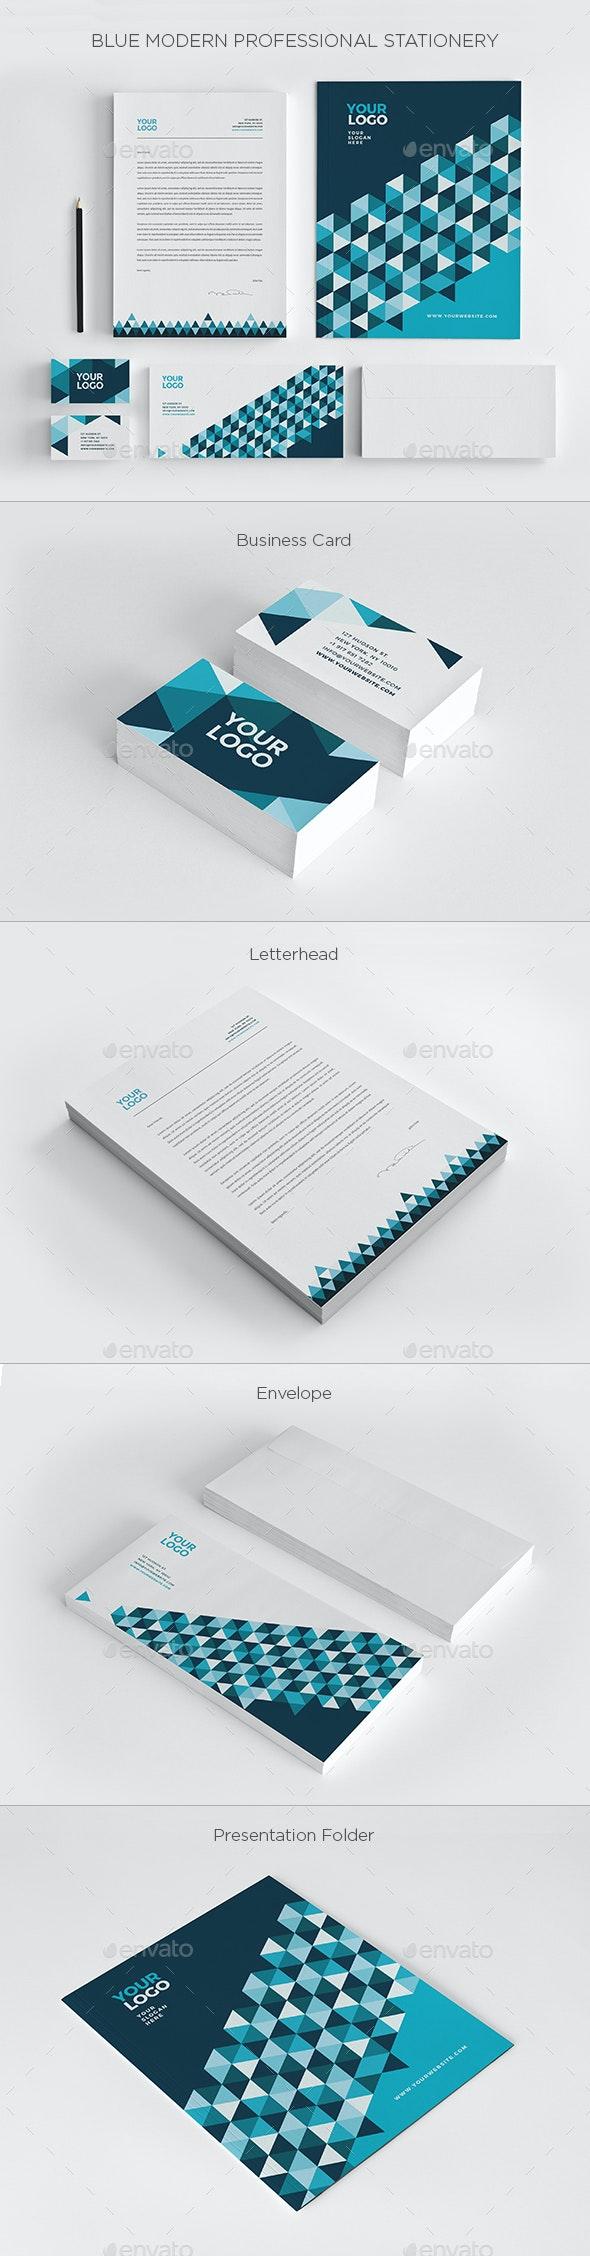 Blue Modern Professional Stationery - Stationery Print Templates